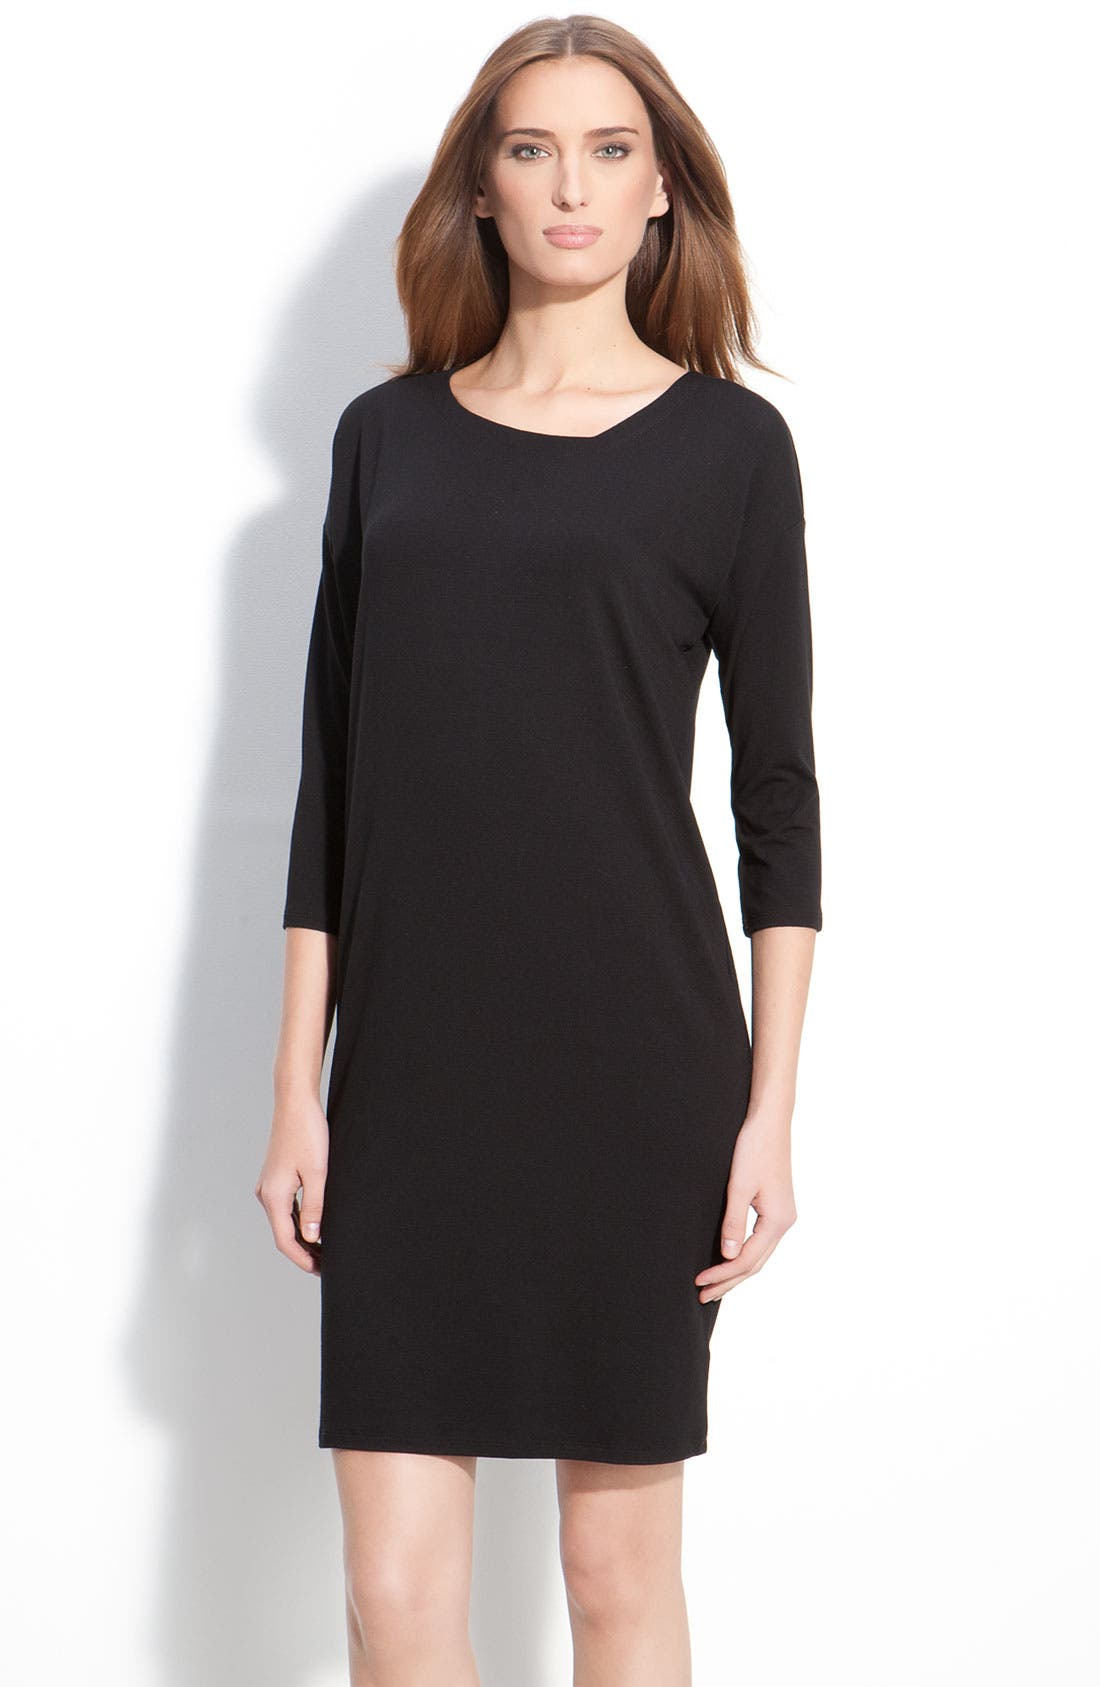 Alternate Image 1 Selected - Eileen Fisher Asymmetrical Neck Dress (Petite)